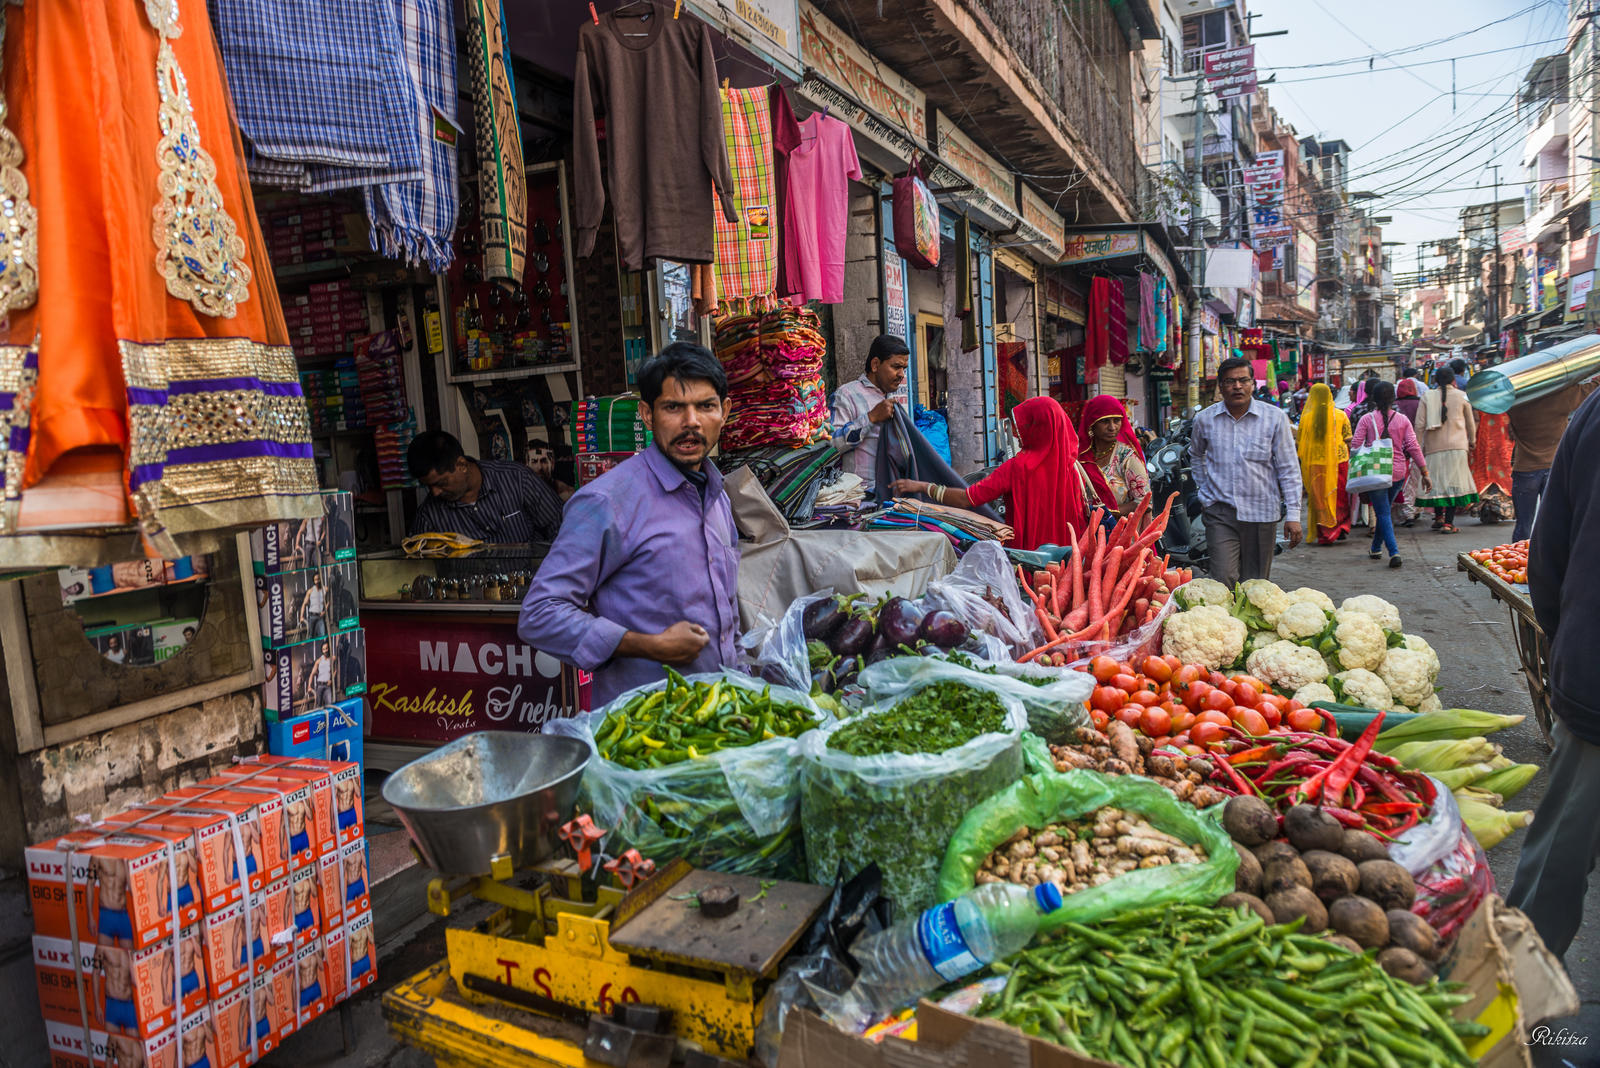 Incredible India - street view in Jodhpur by Rikitza